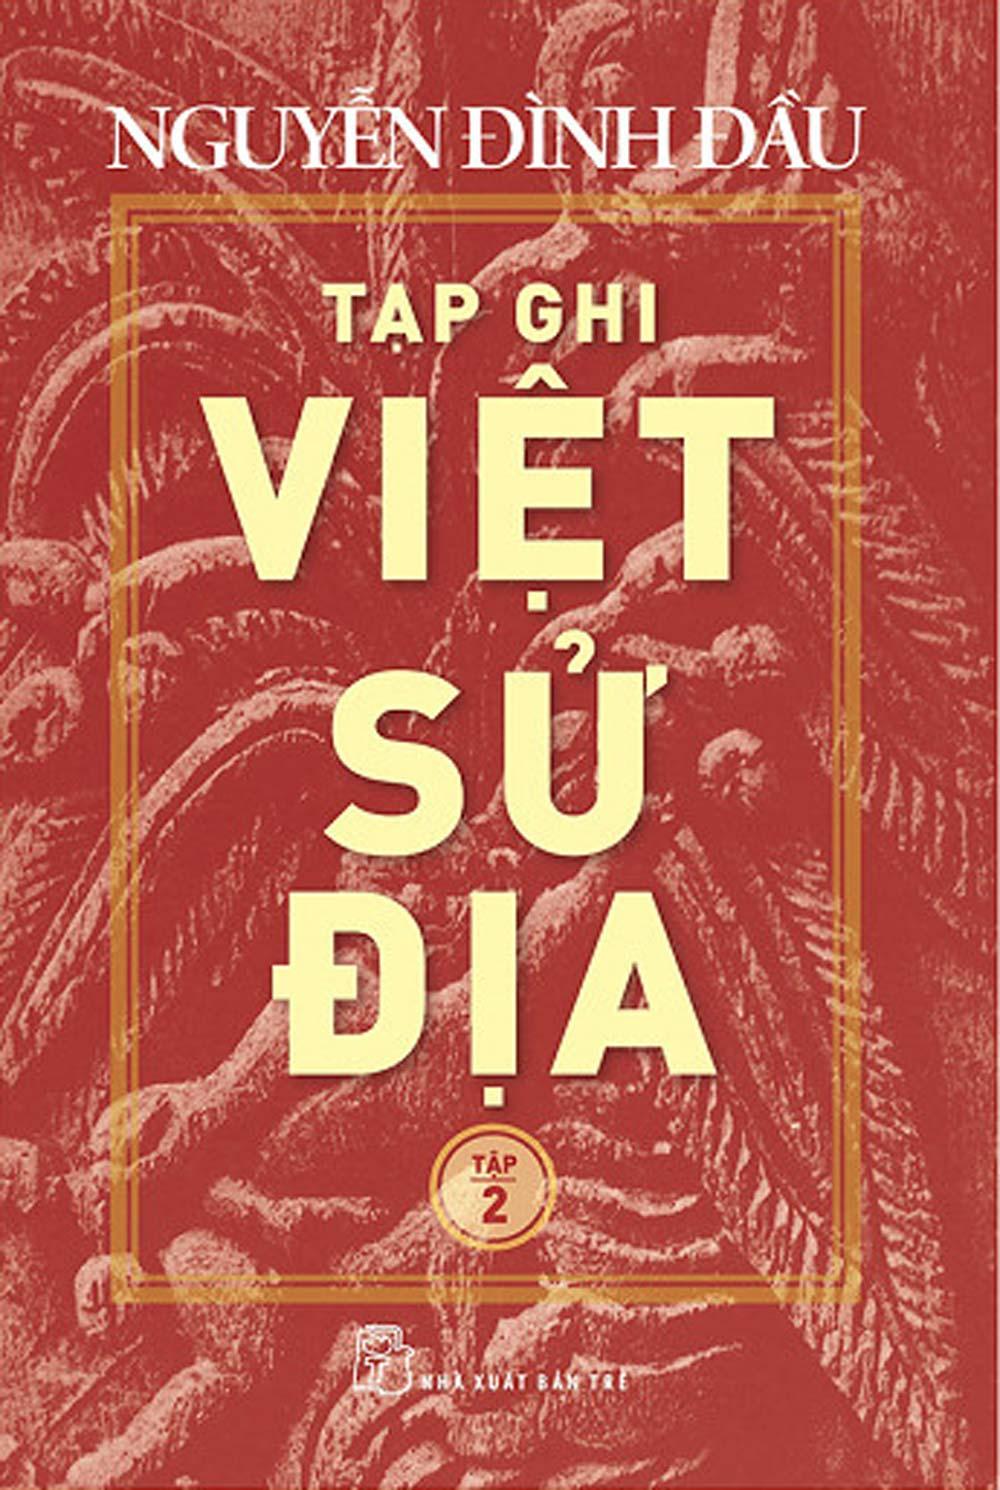 Tạp Ghi Việt Sử Địa (Tập 2) - EBOOK/PDF/PRC/EPUB